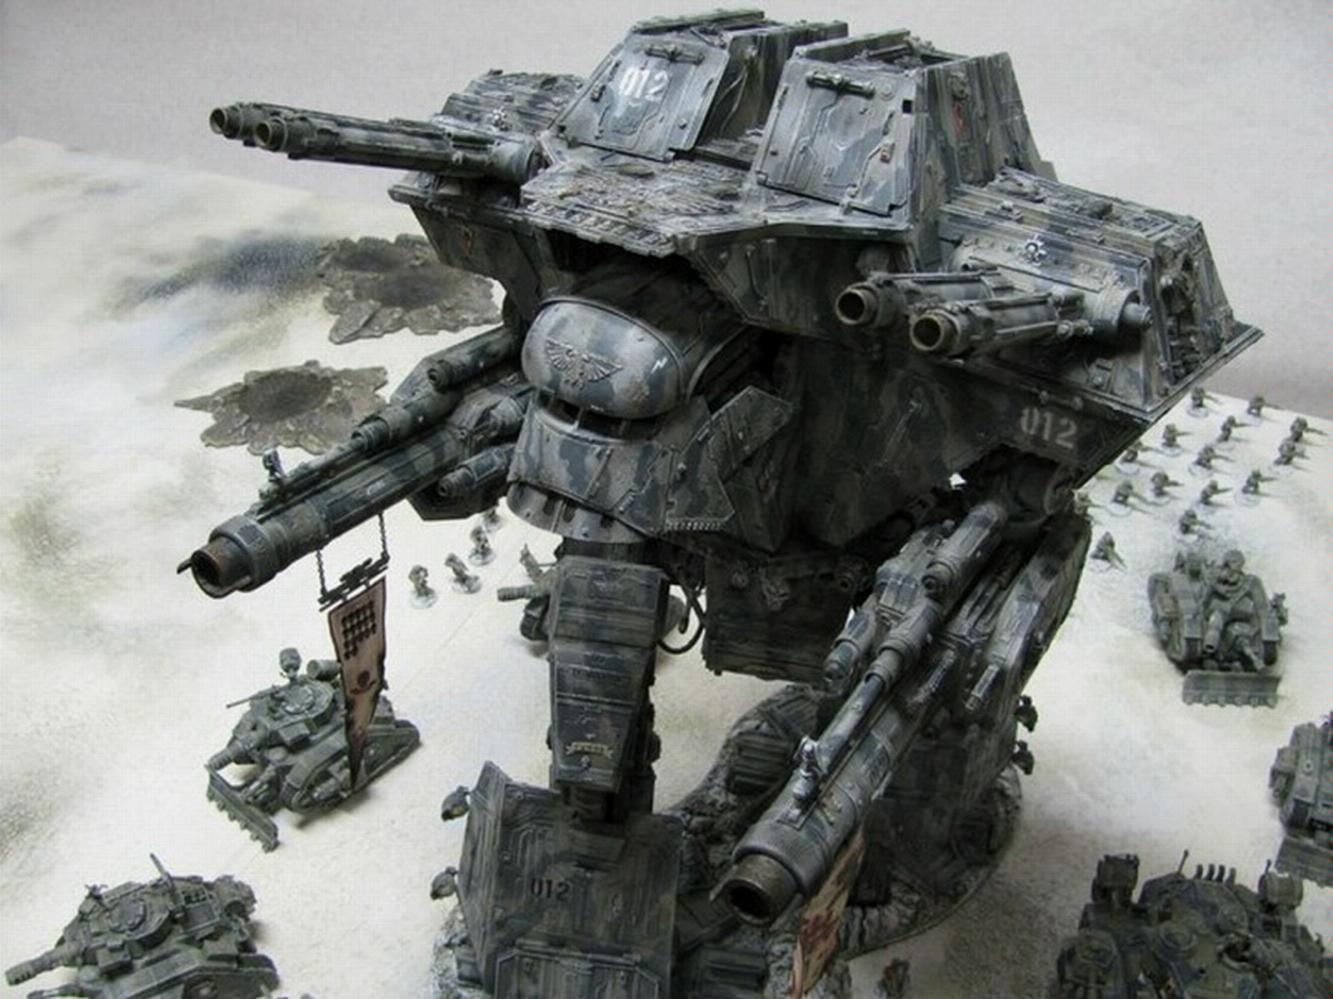 Titan, Warhammer 40,000, Warlord